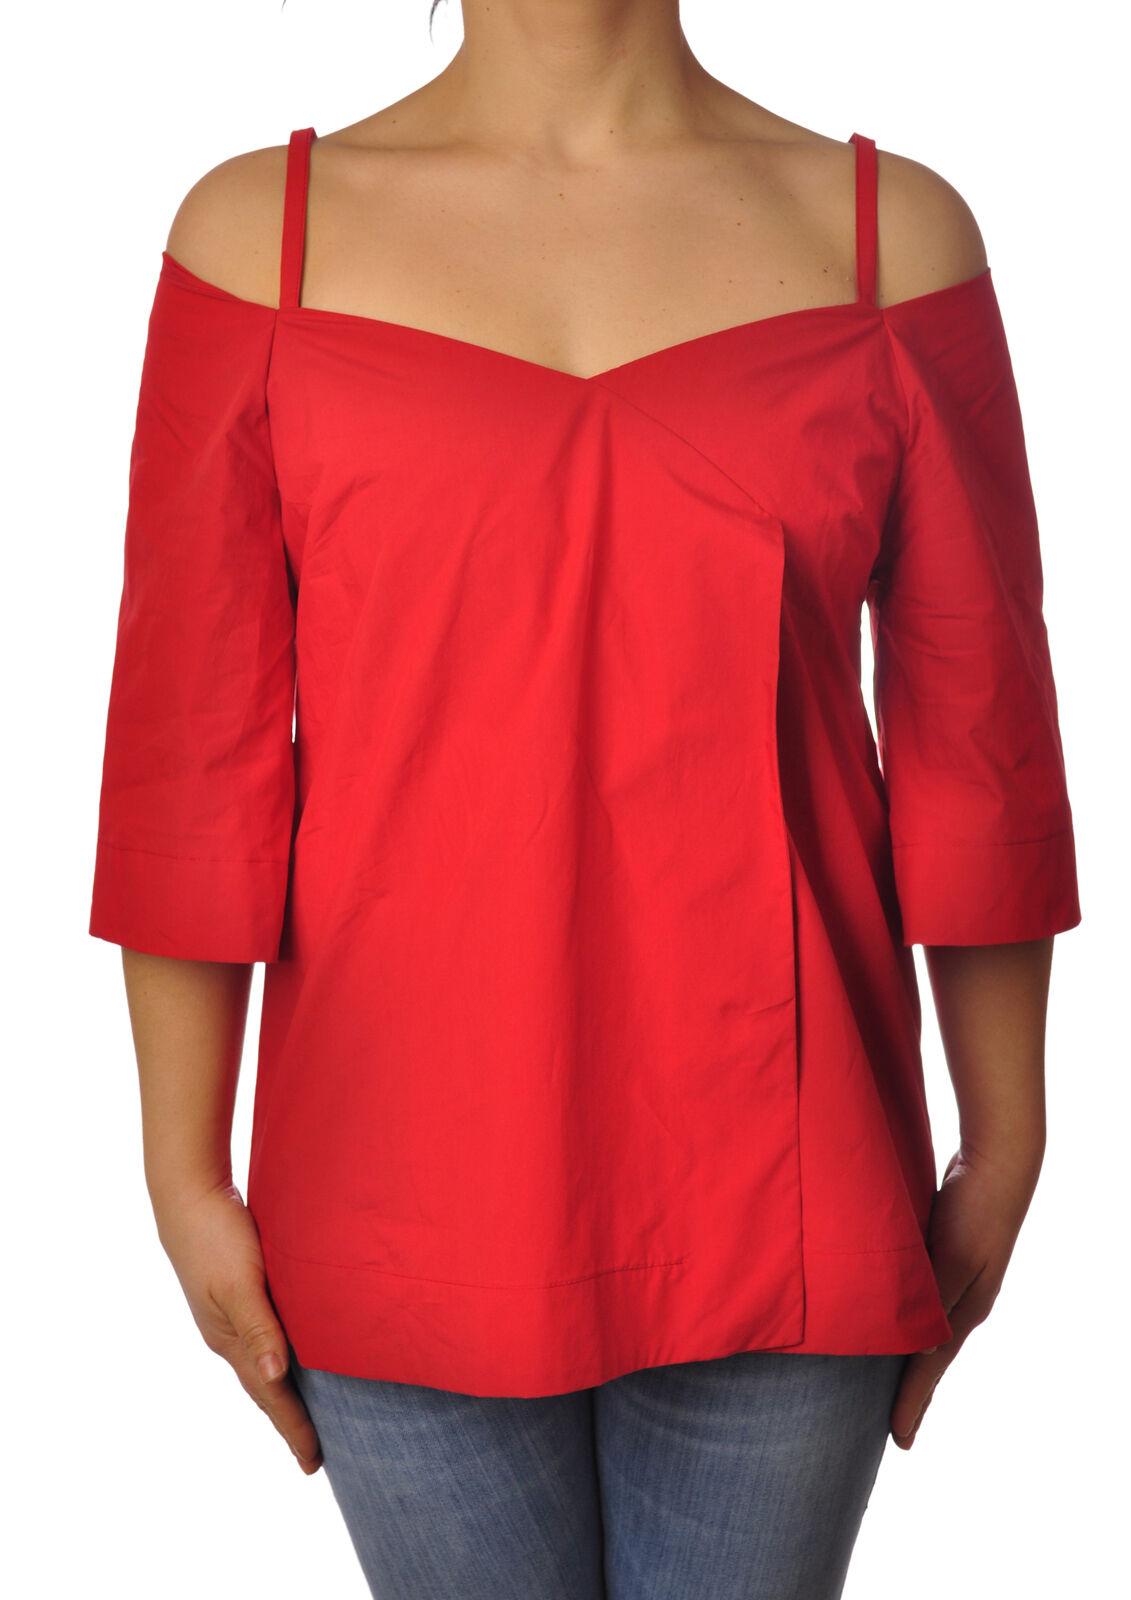 Ottod'ame - Shirts-Blouses - Woman - rot - 4955113F183832